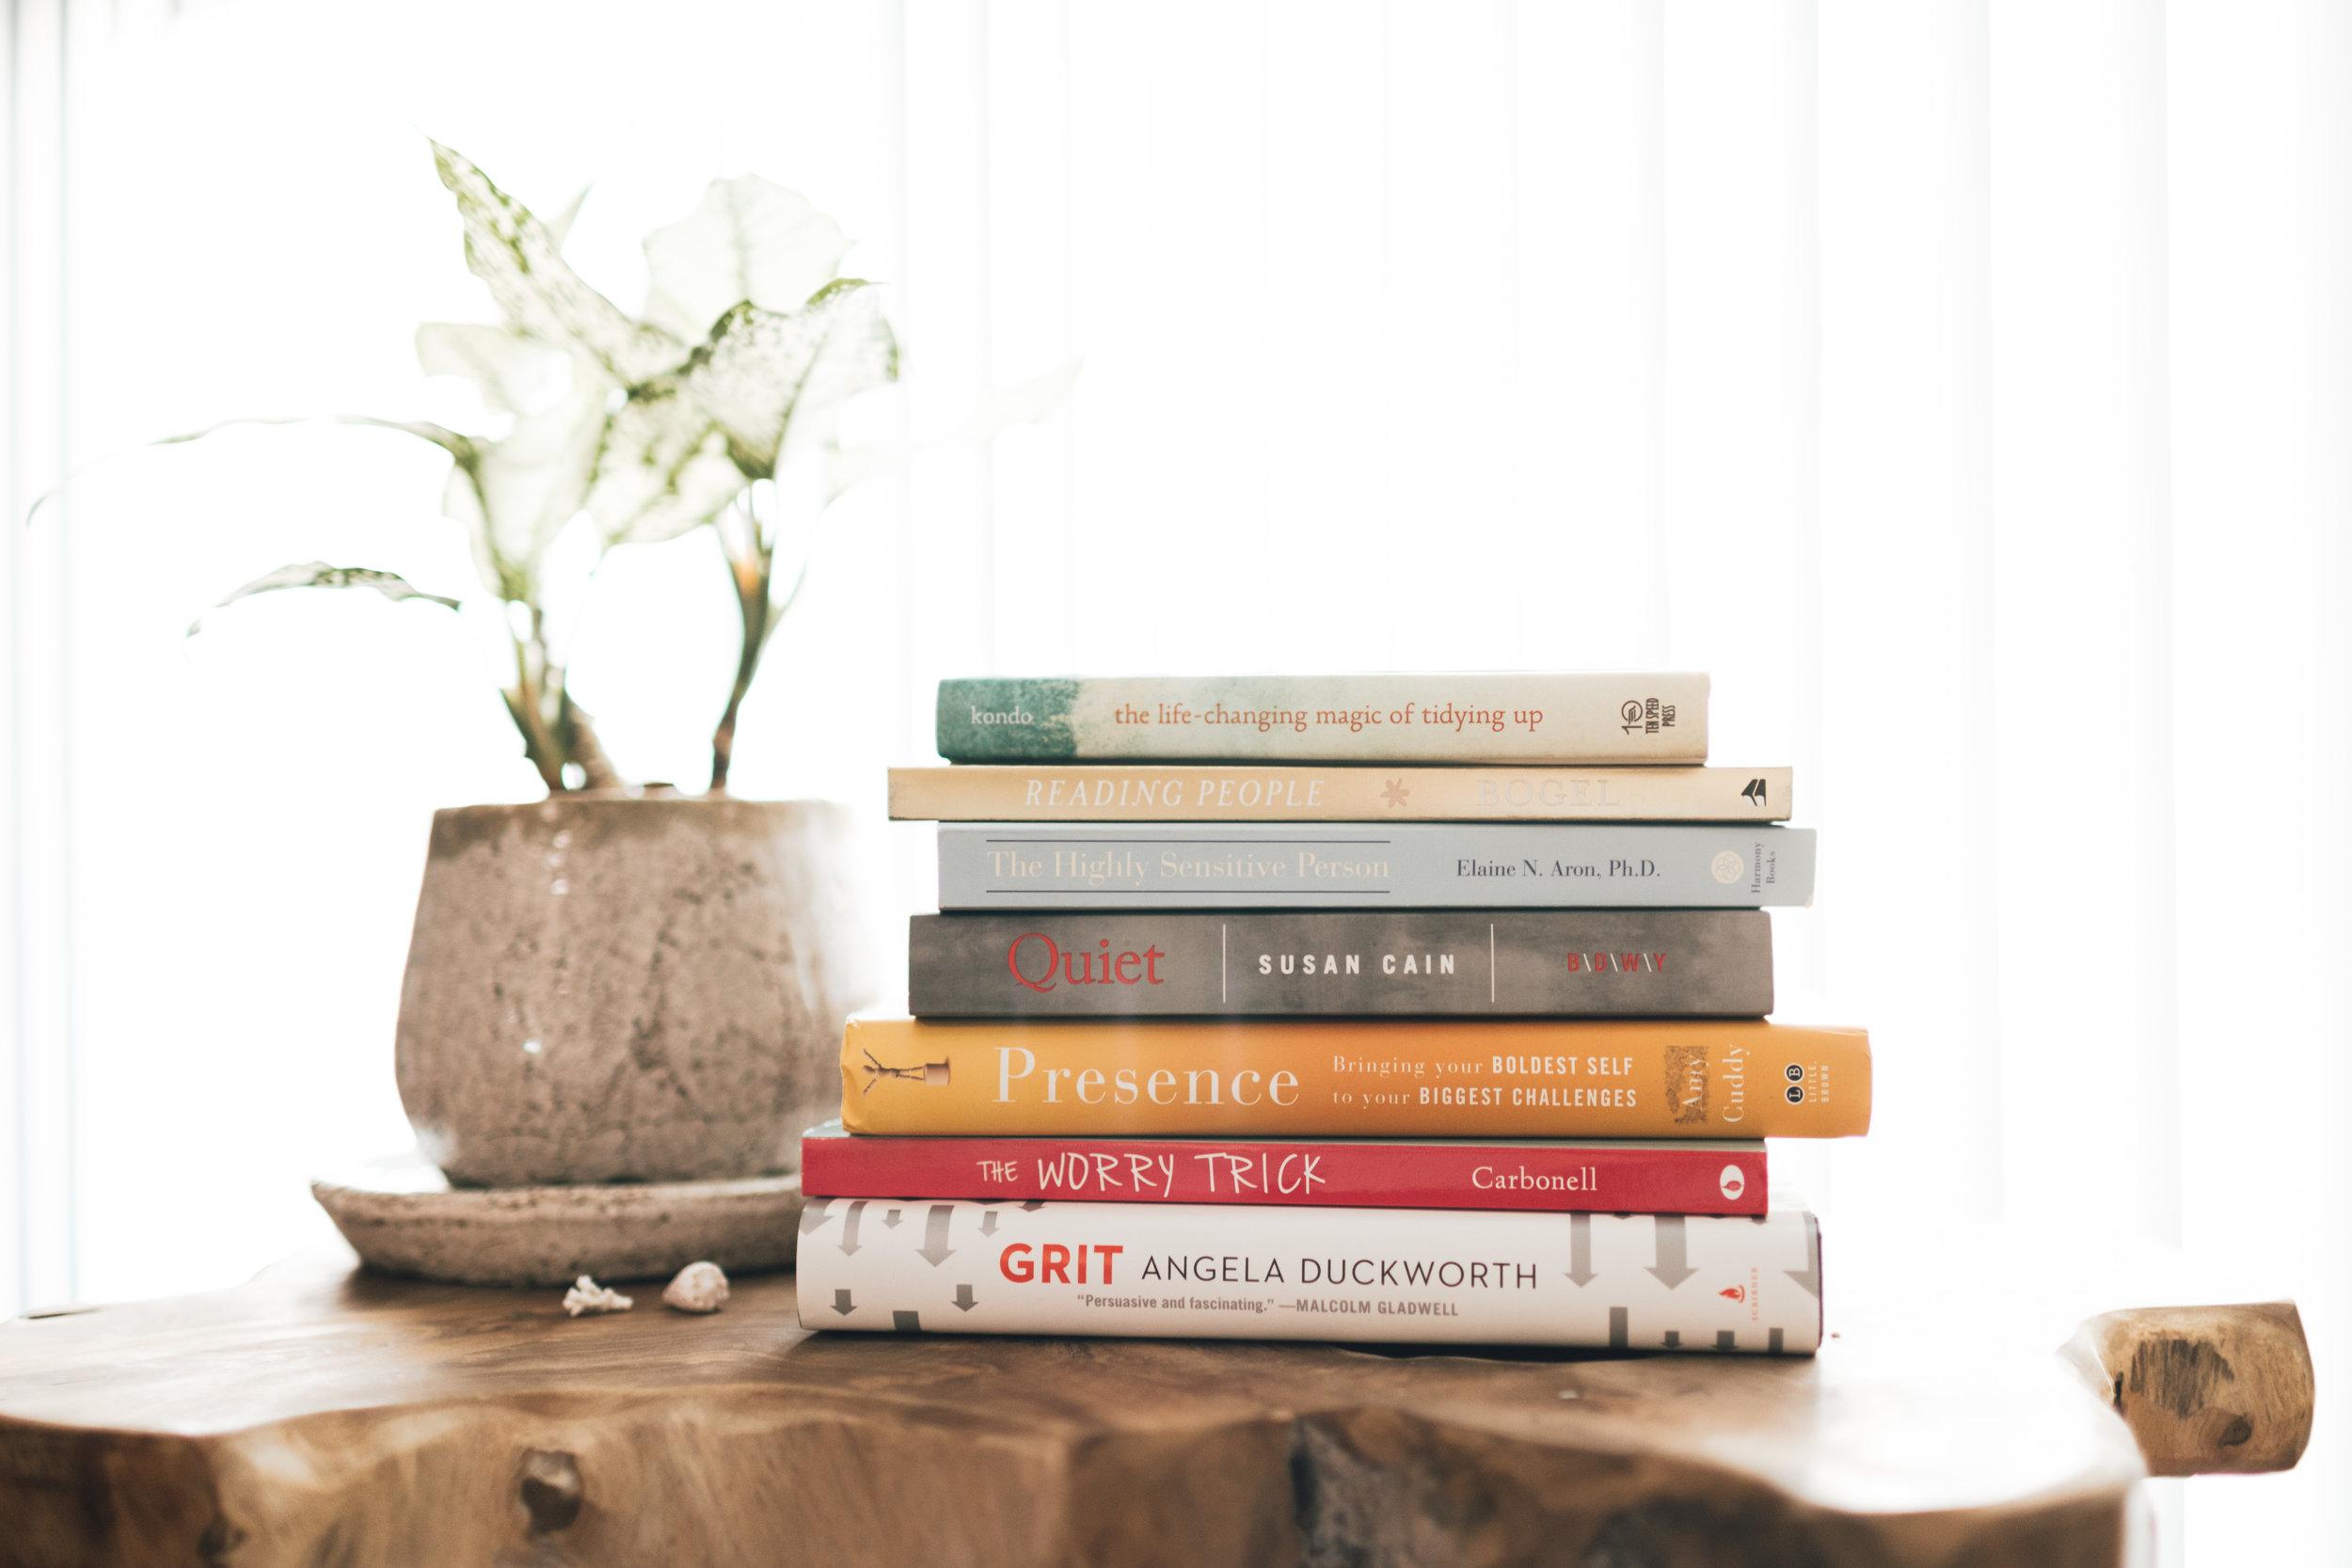 self-improvement-books-photos-by-samantha-look.jpg